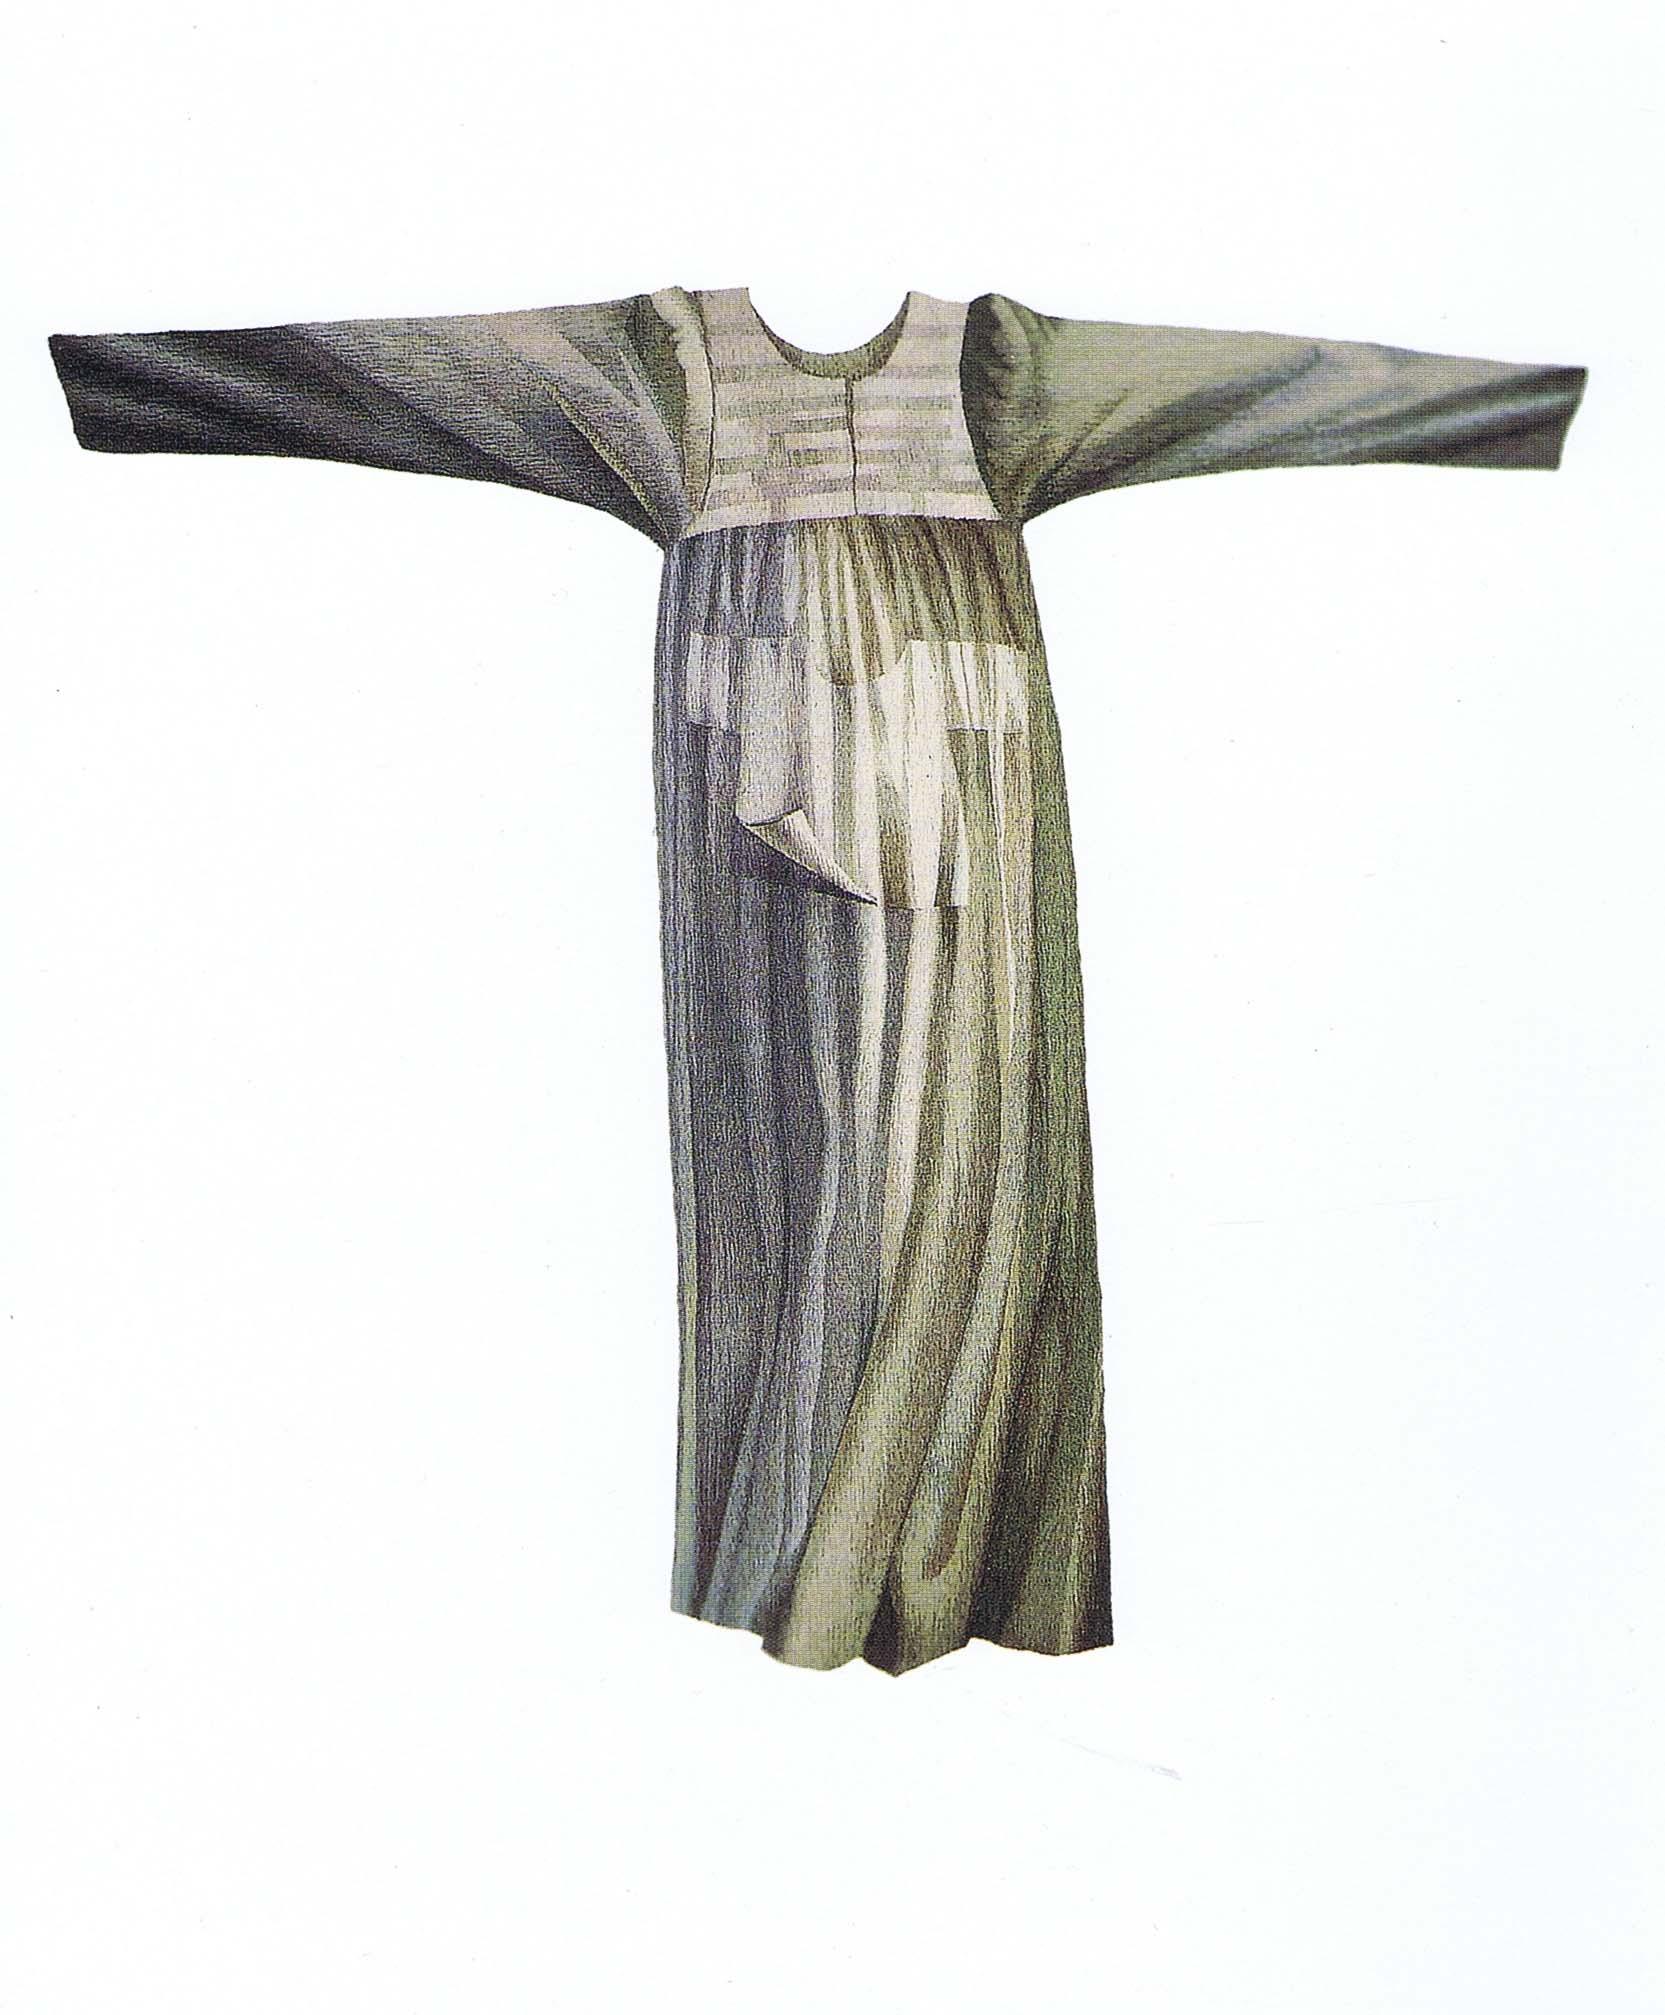 ANYASÁG - gobelin; gyapjú, pamut, selyem, 1986 (220×240 cm)